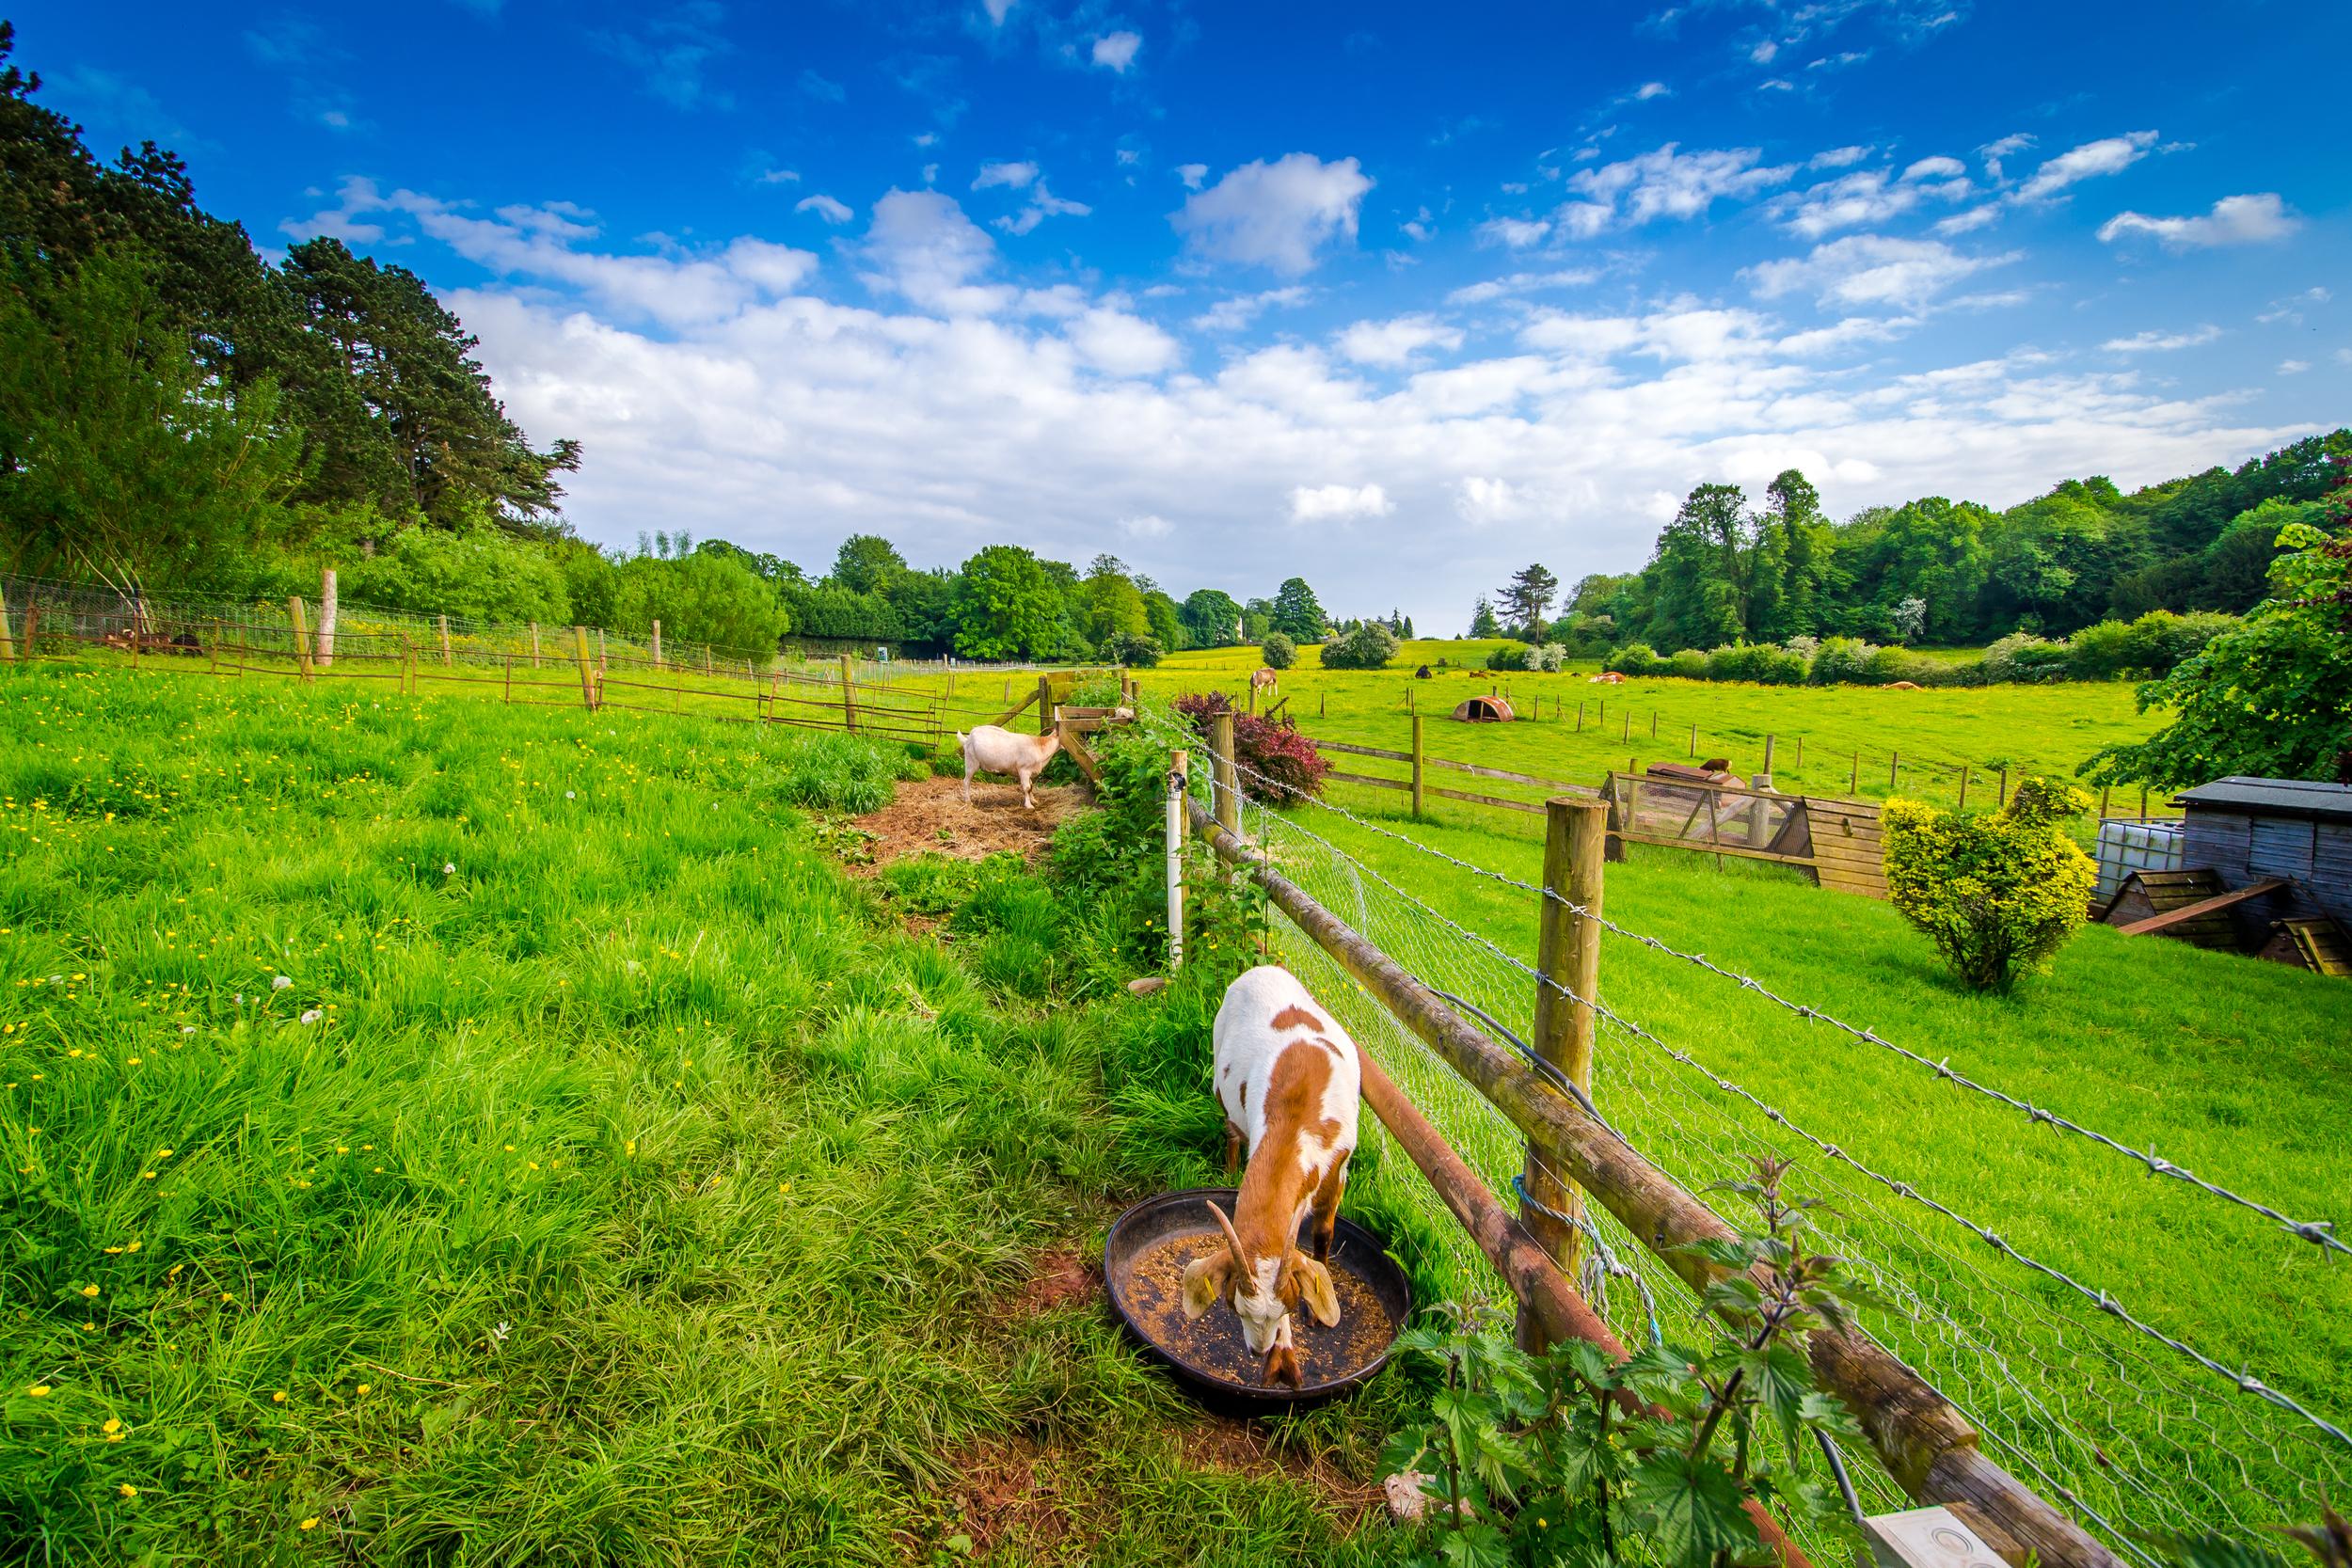 Kellogg - travel - England 2014-0434.jpg